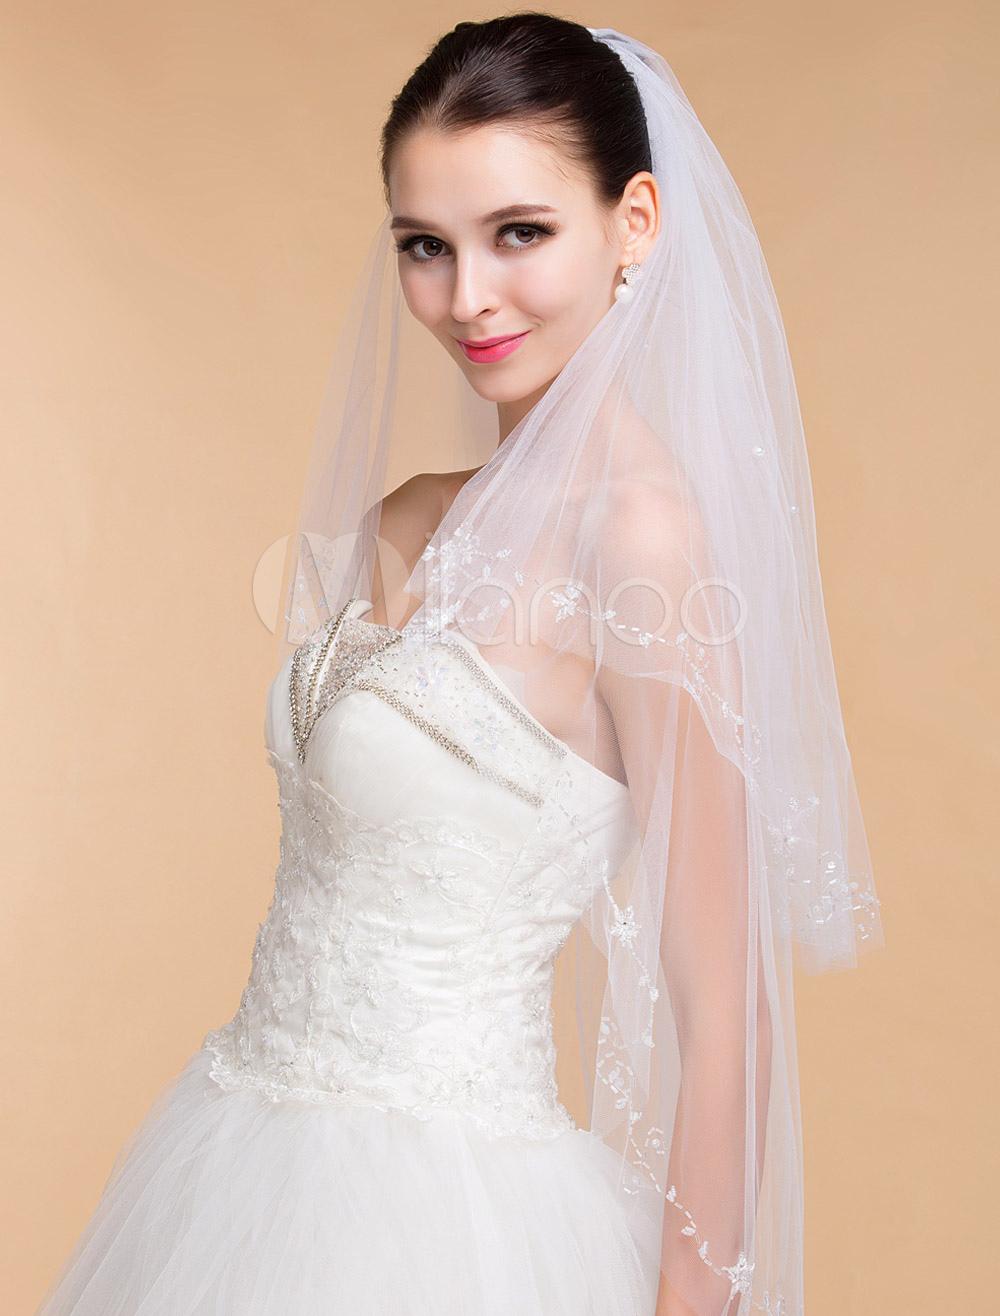 Two-Tier Wedding Veil With Handmade Beaded Edge